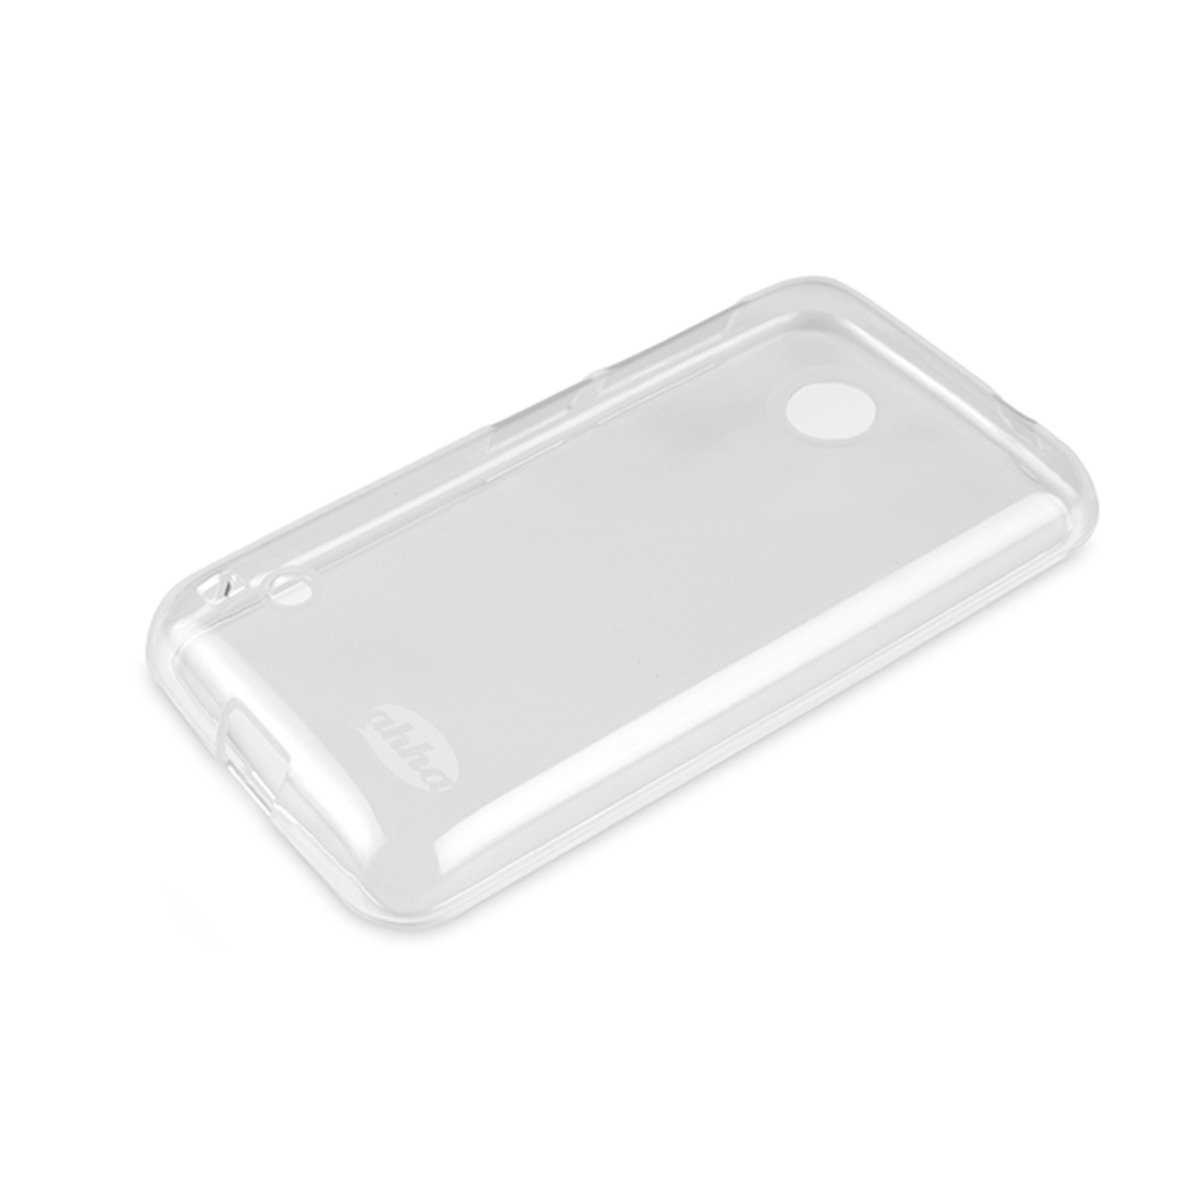 Nokia Lumia 530 手機保護殼 GummiShell MOYA (透明)